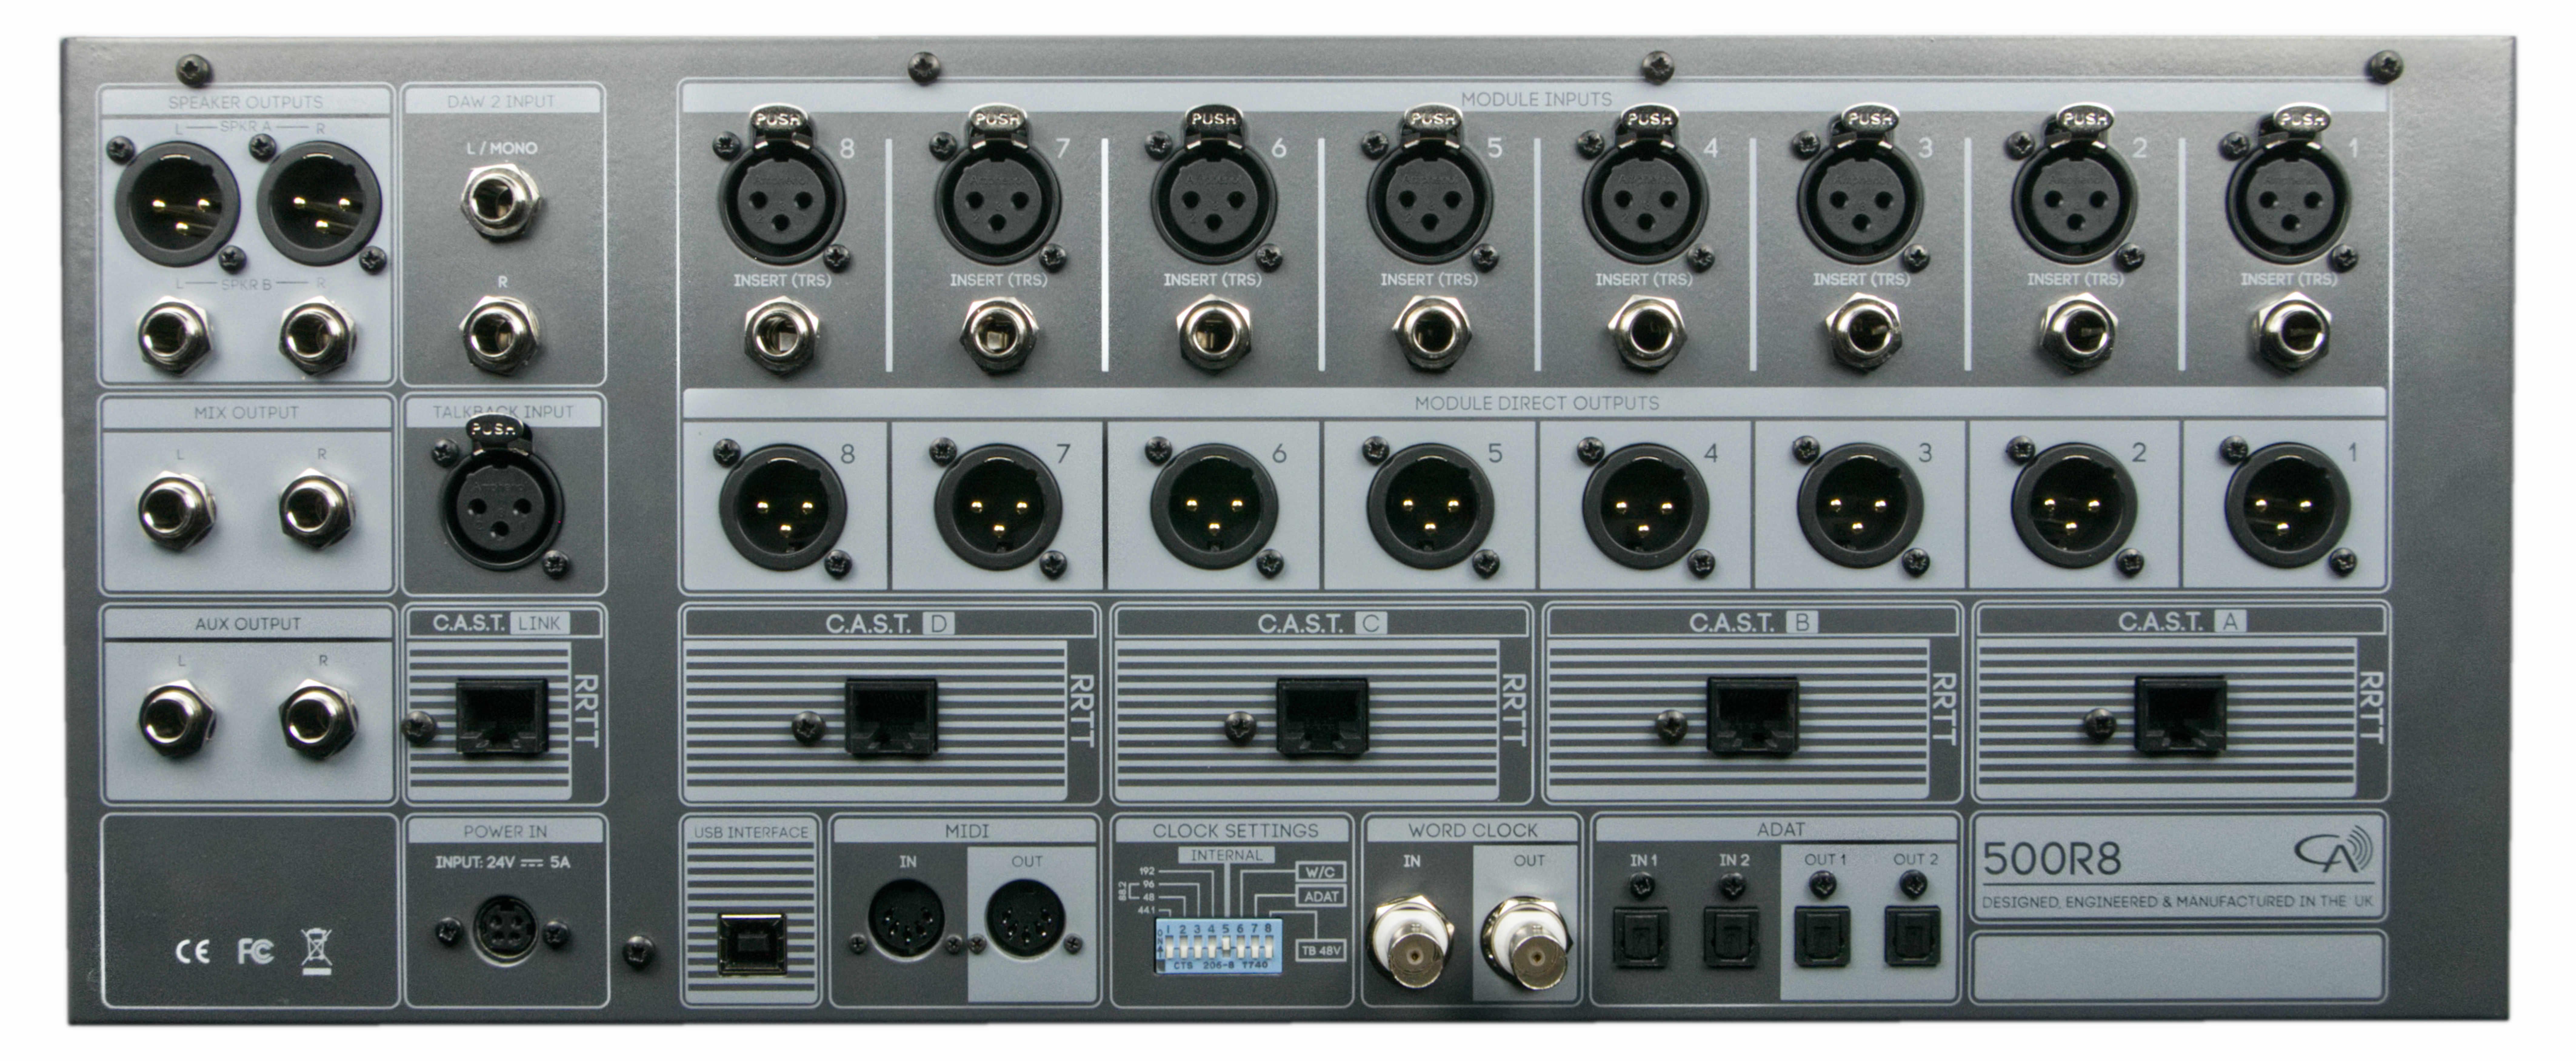 Cranborne Audio 500R8 - 500R8 - Analogue/Digital Hybrid USB Audio